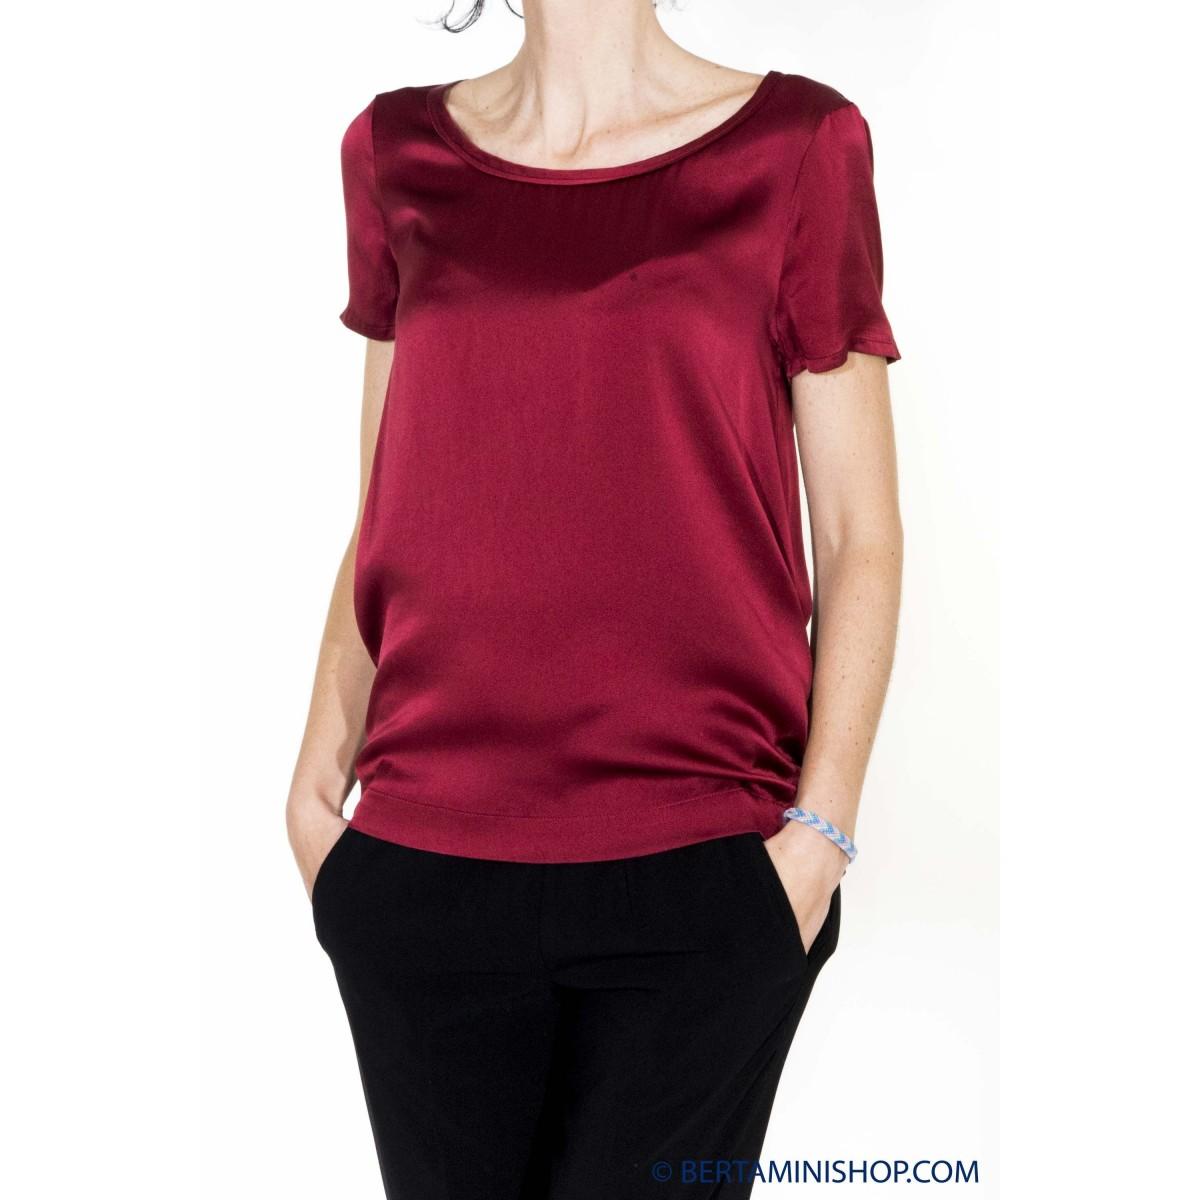 T-shirt donna Jucca - 2105l t-shirt seta lucida